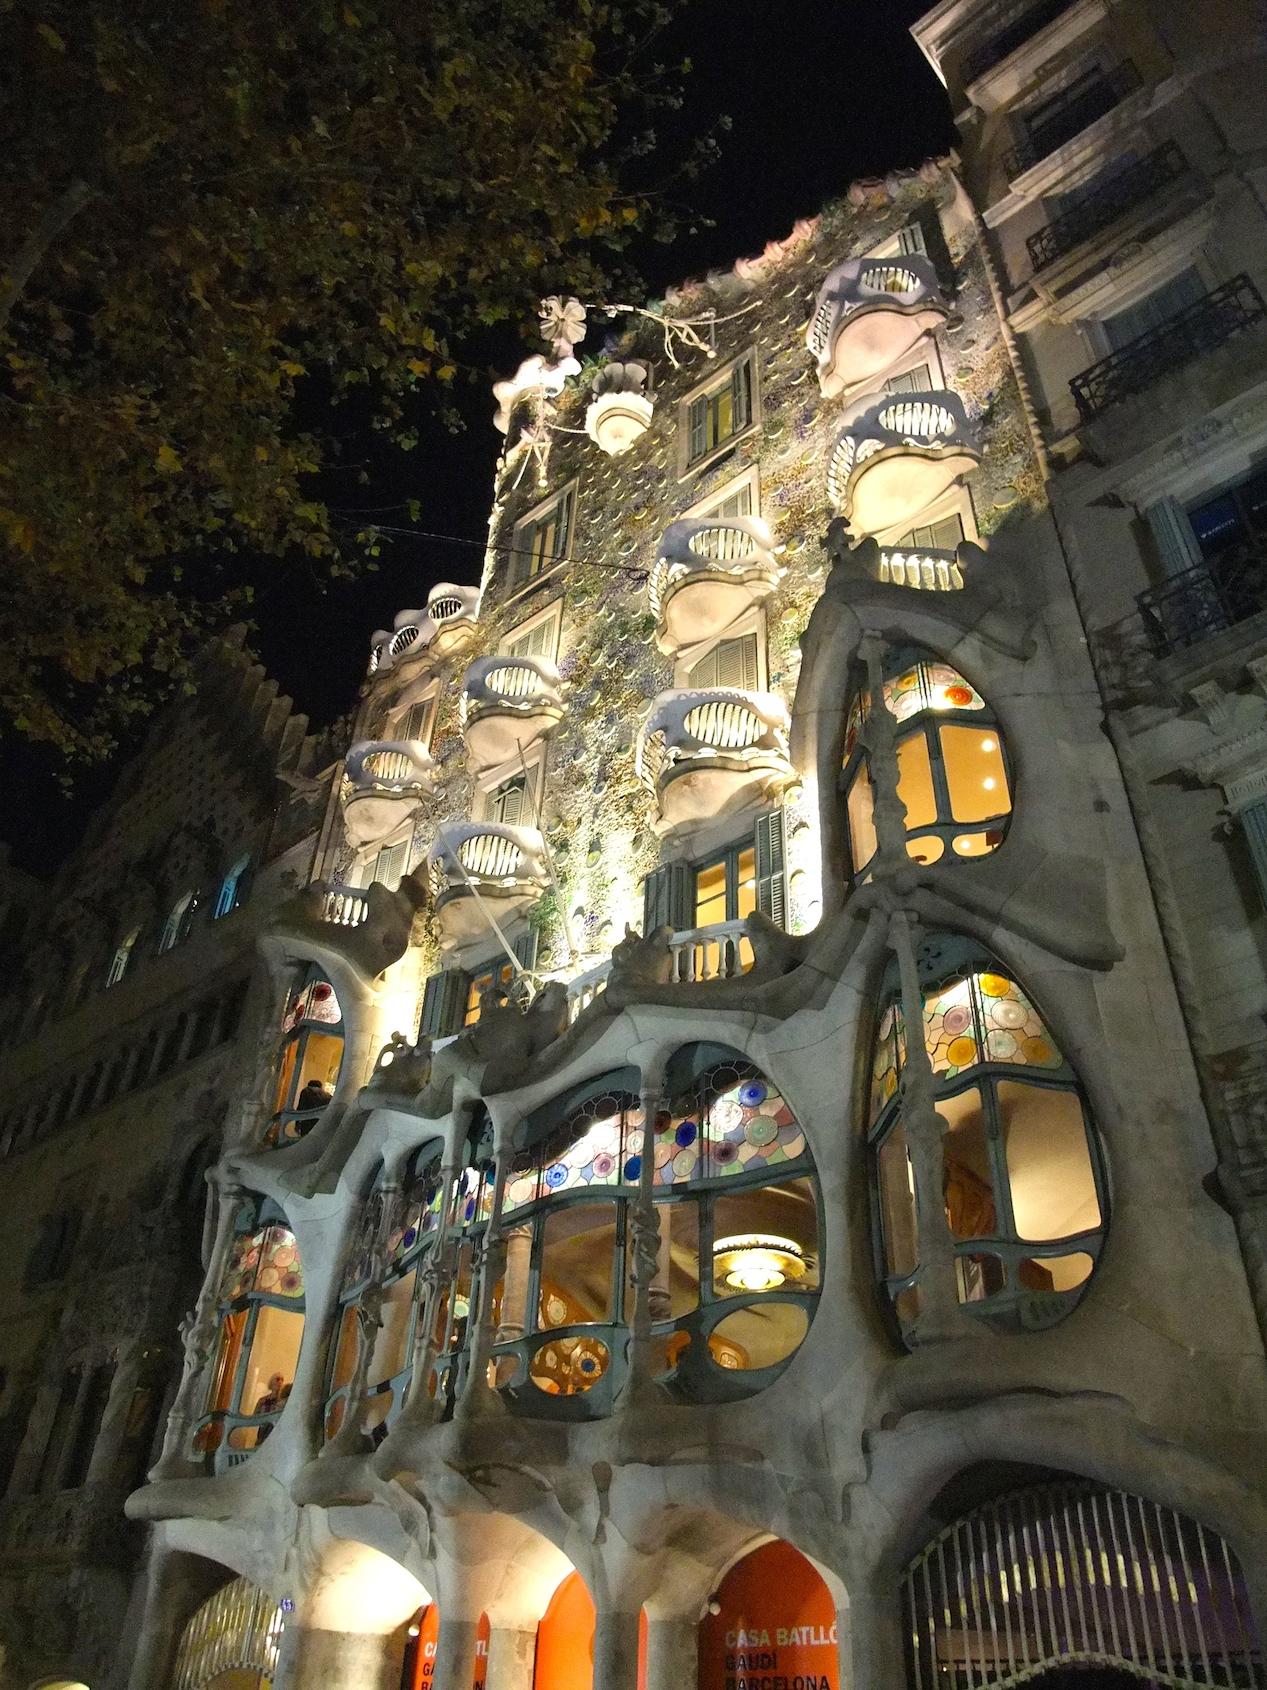 The façade of Casa Batlló